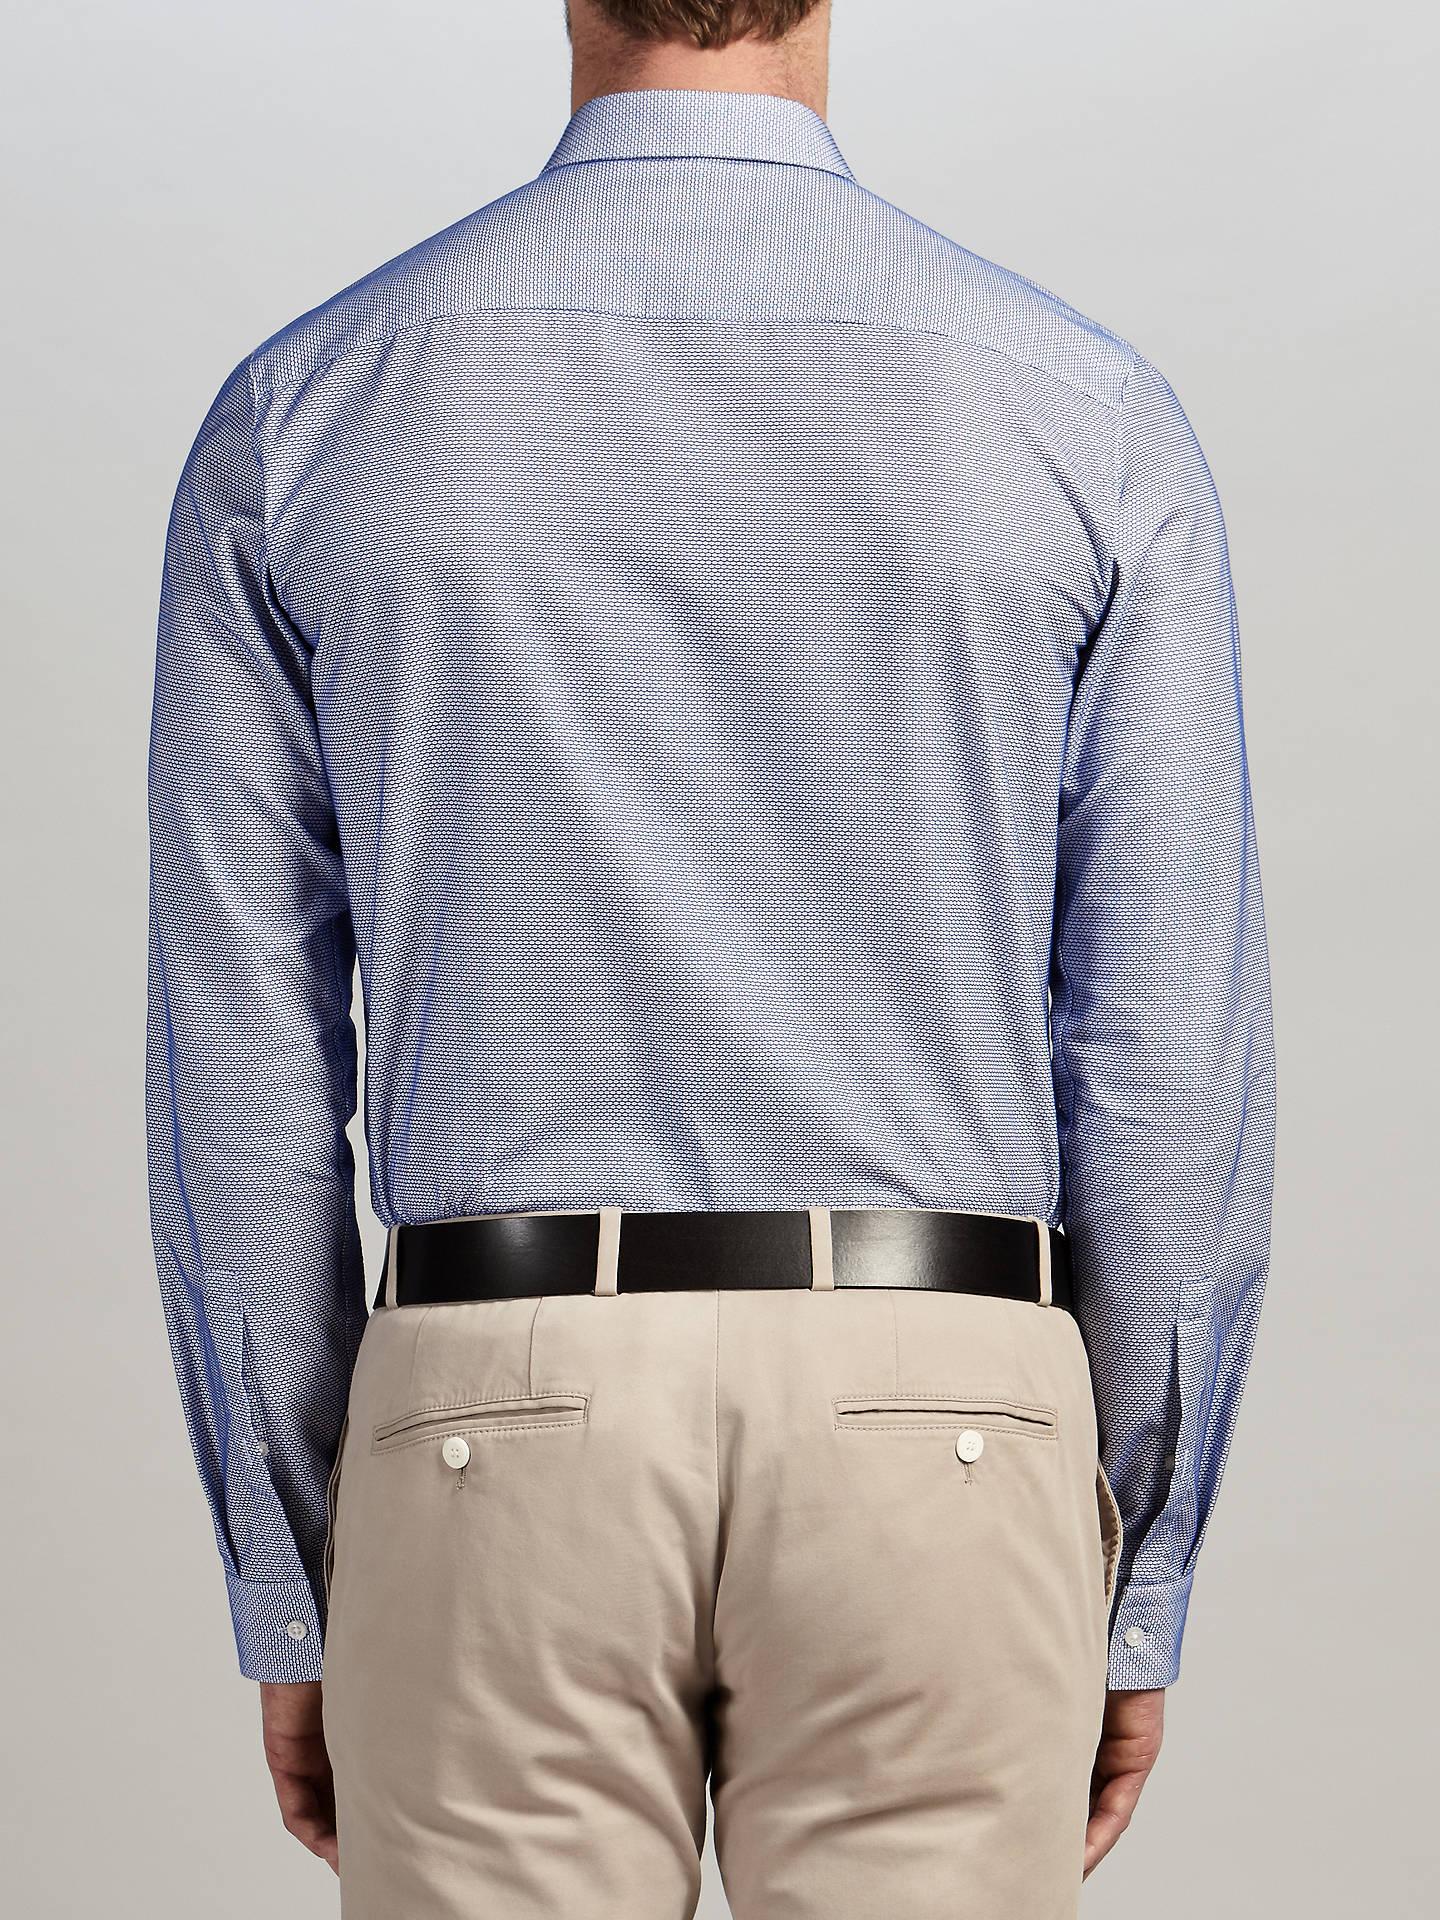 7fafae205 ... Buy HUGO by Hugo Boss Erondo Pattern Extra Slim Fit Shirt, Medium Blue,  15 ...